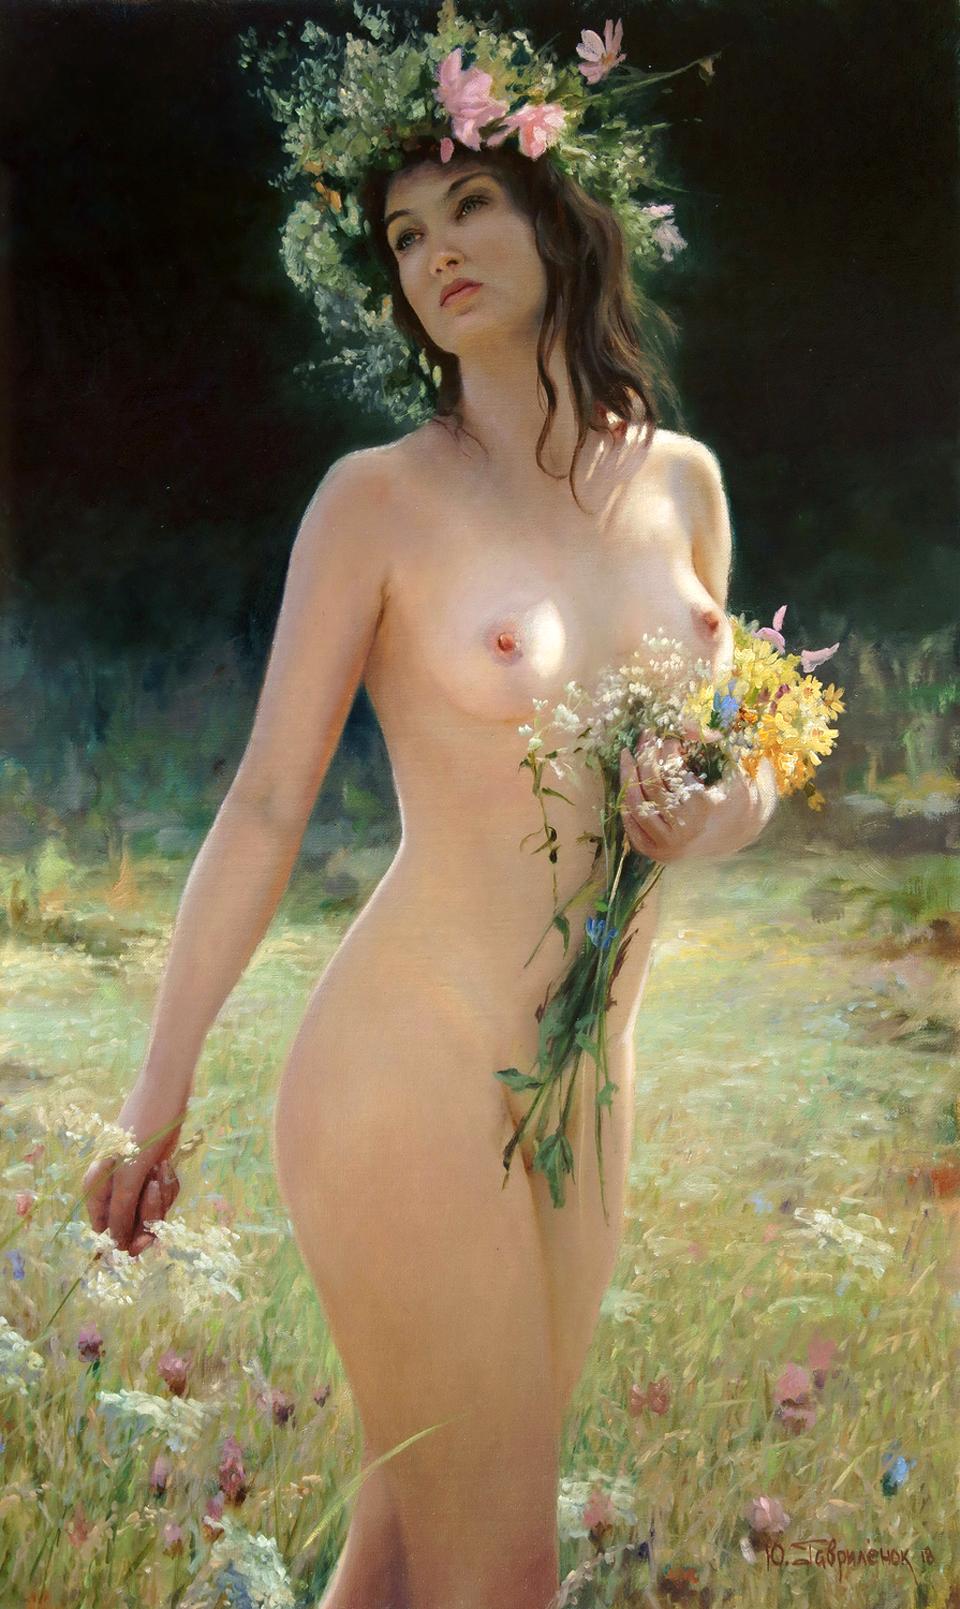 www.PaintingsGallery.pro_Gavrilenok_Yuriy_The_First_Day_Of_Summer_large_264193.jpg